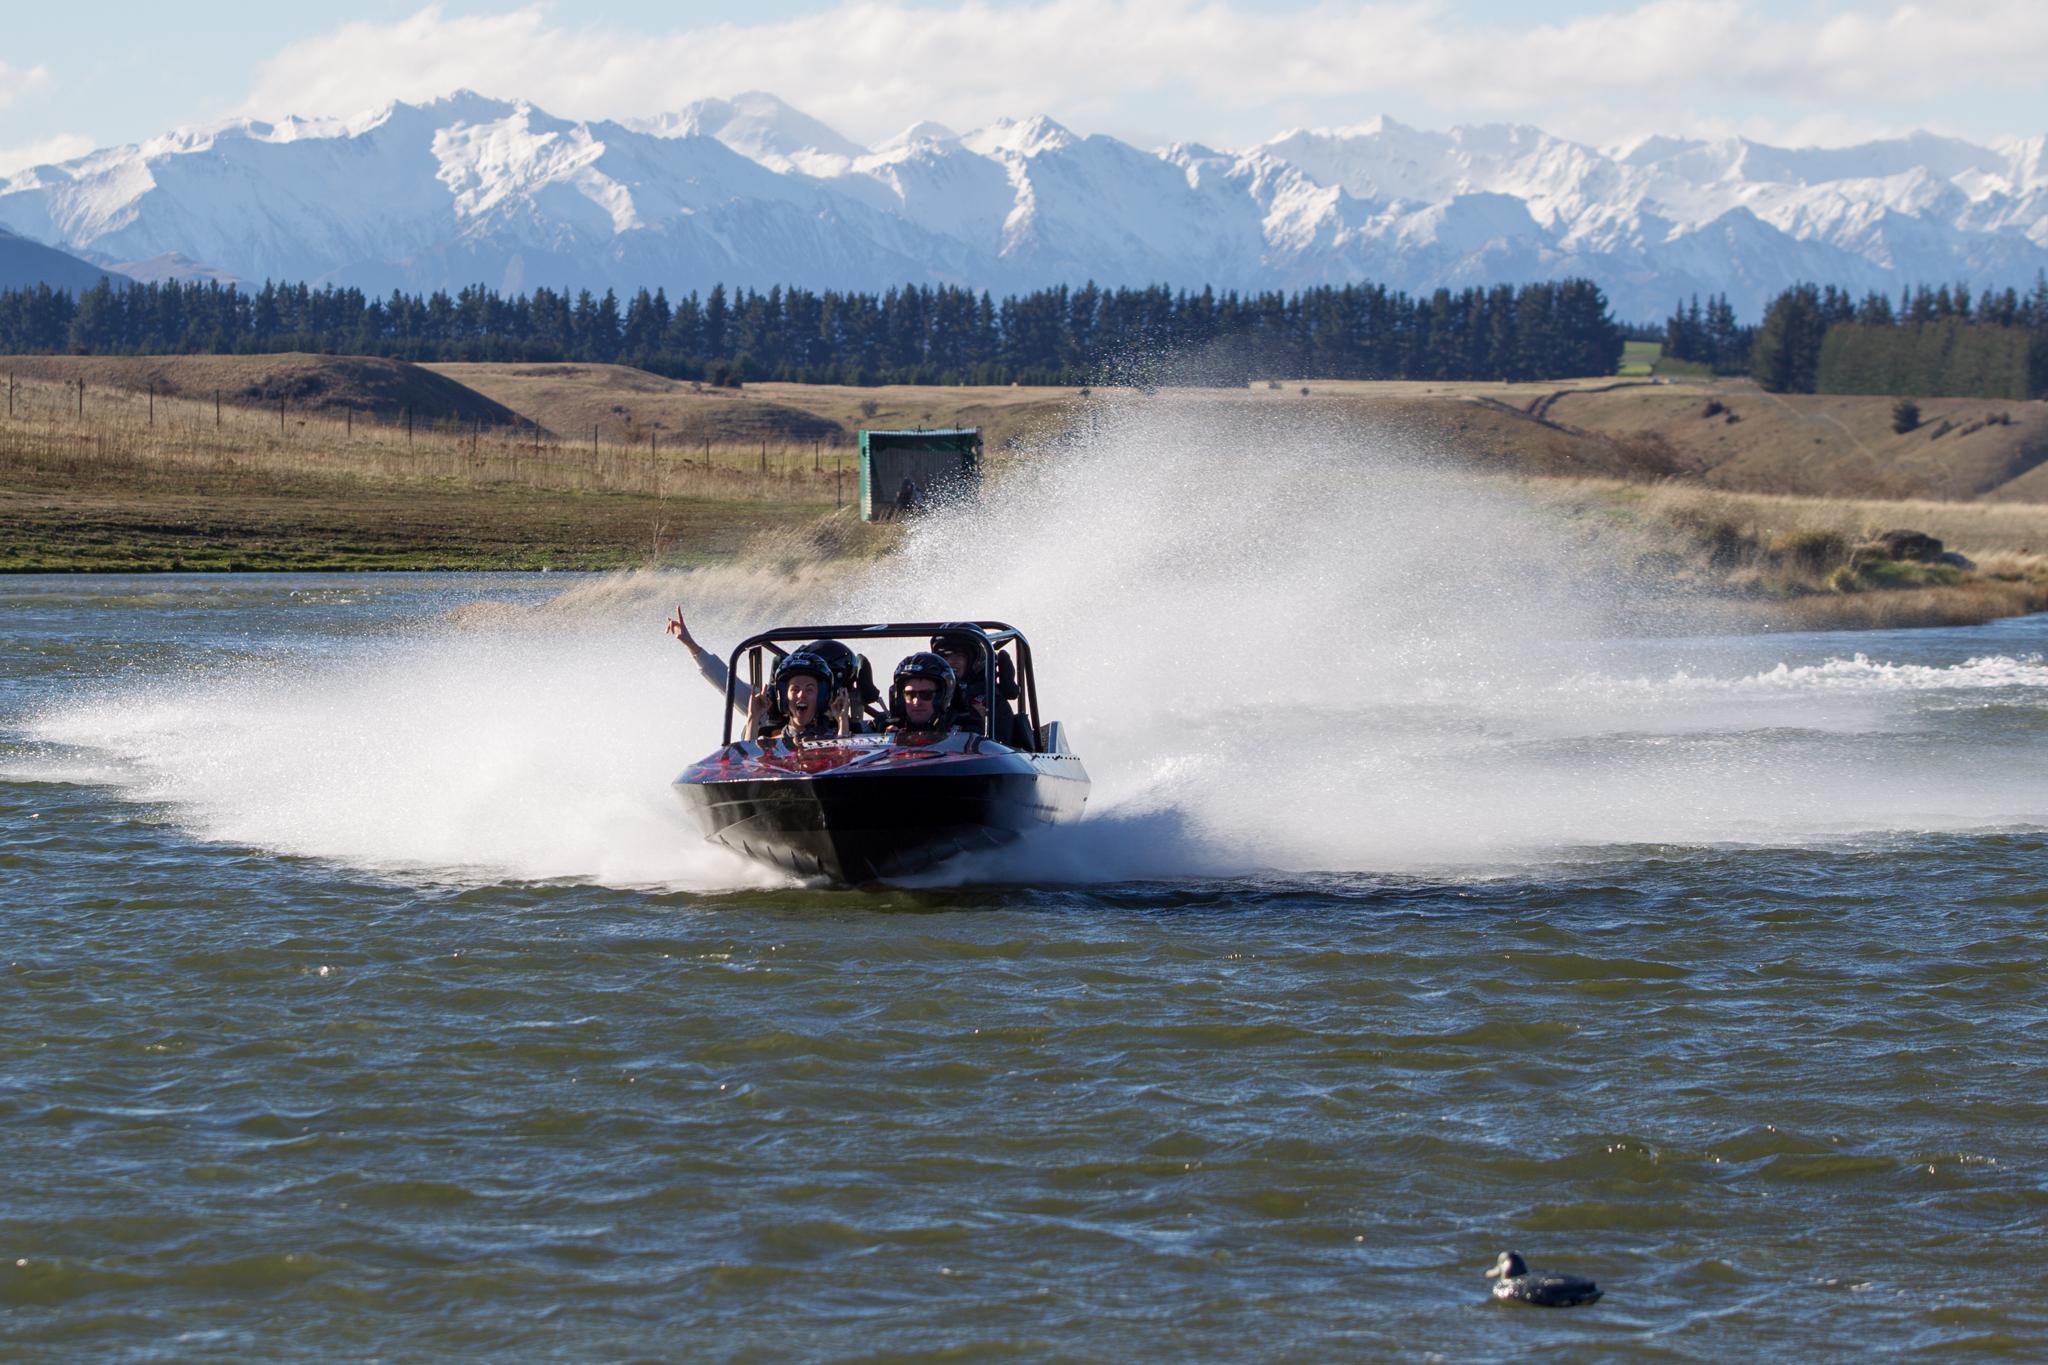 Jet Boat fun ride